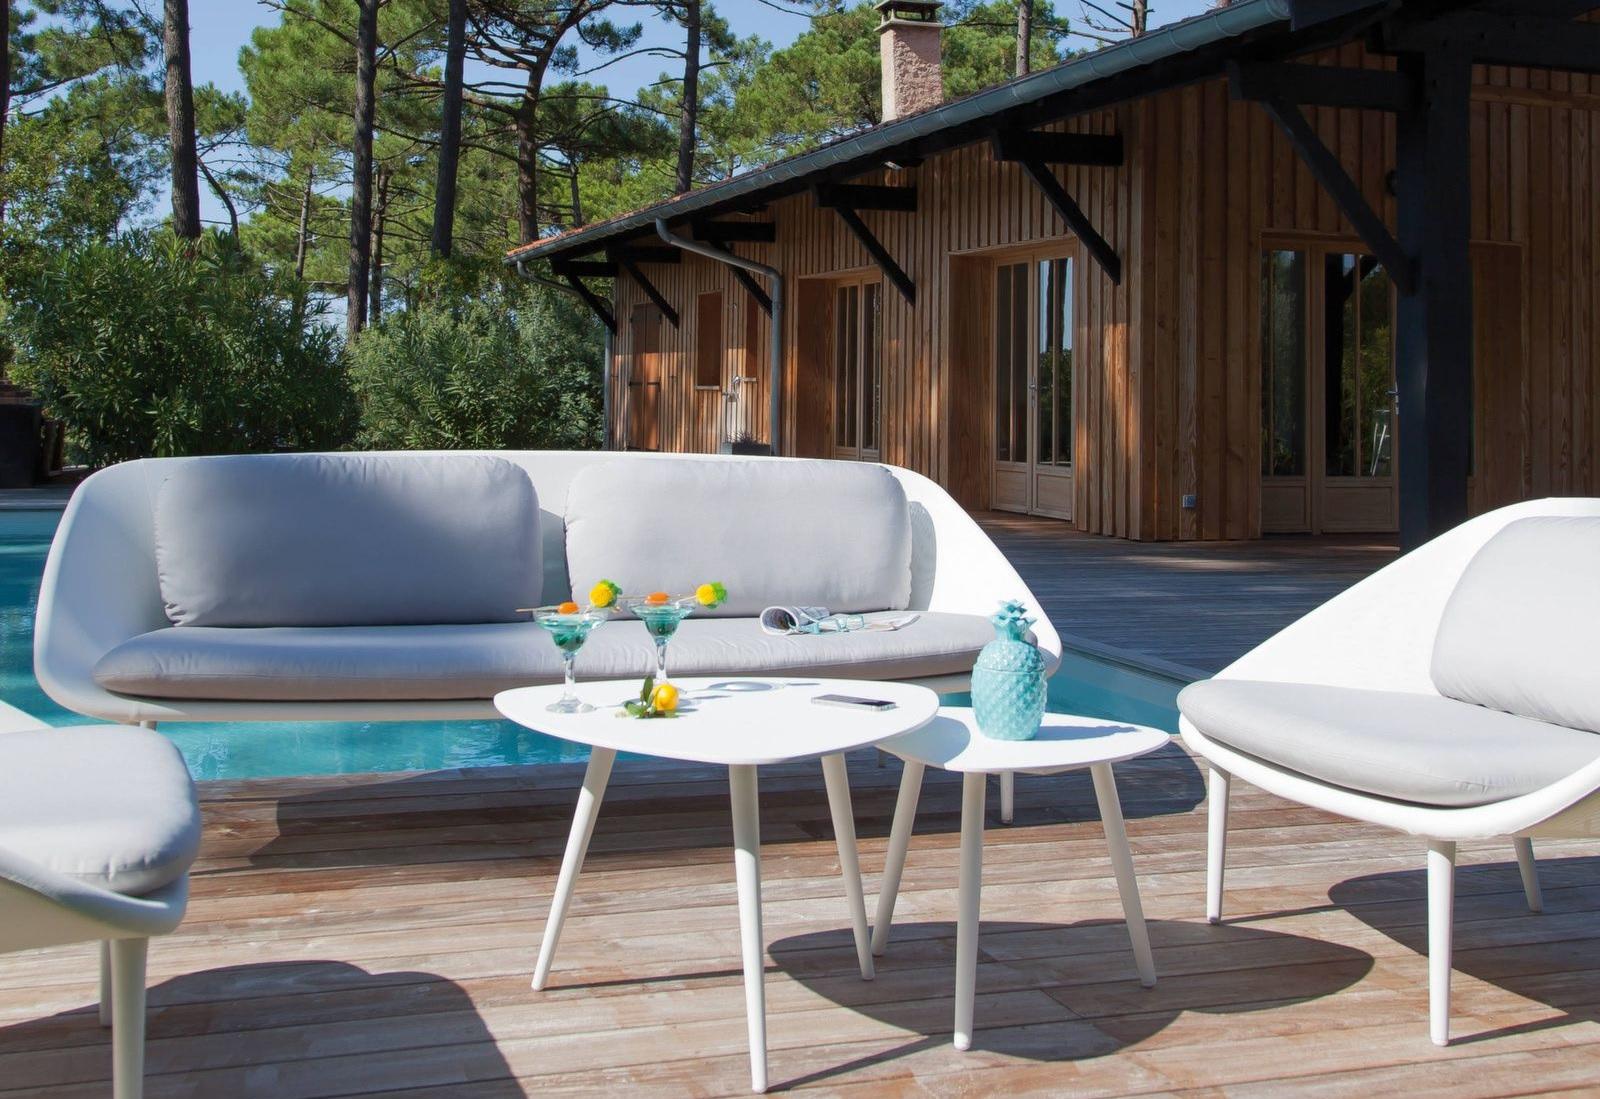 mobilier de jardin blanc le charme et l 39 l gance le blog. Black Bedroom Furniture Sets. Home Design Ideas